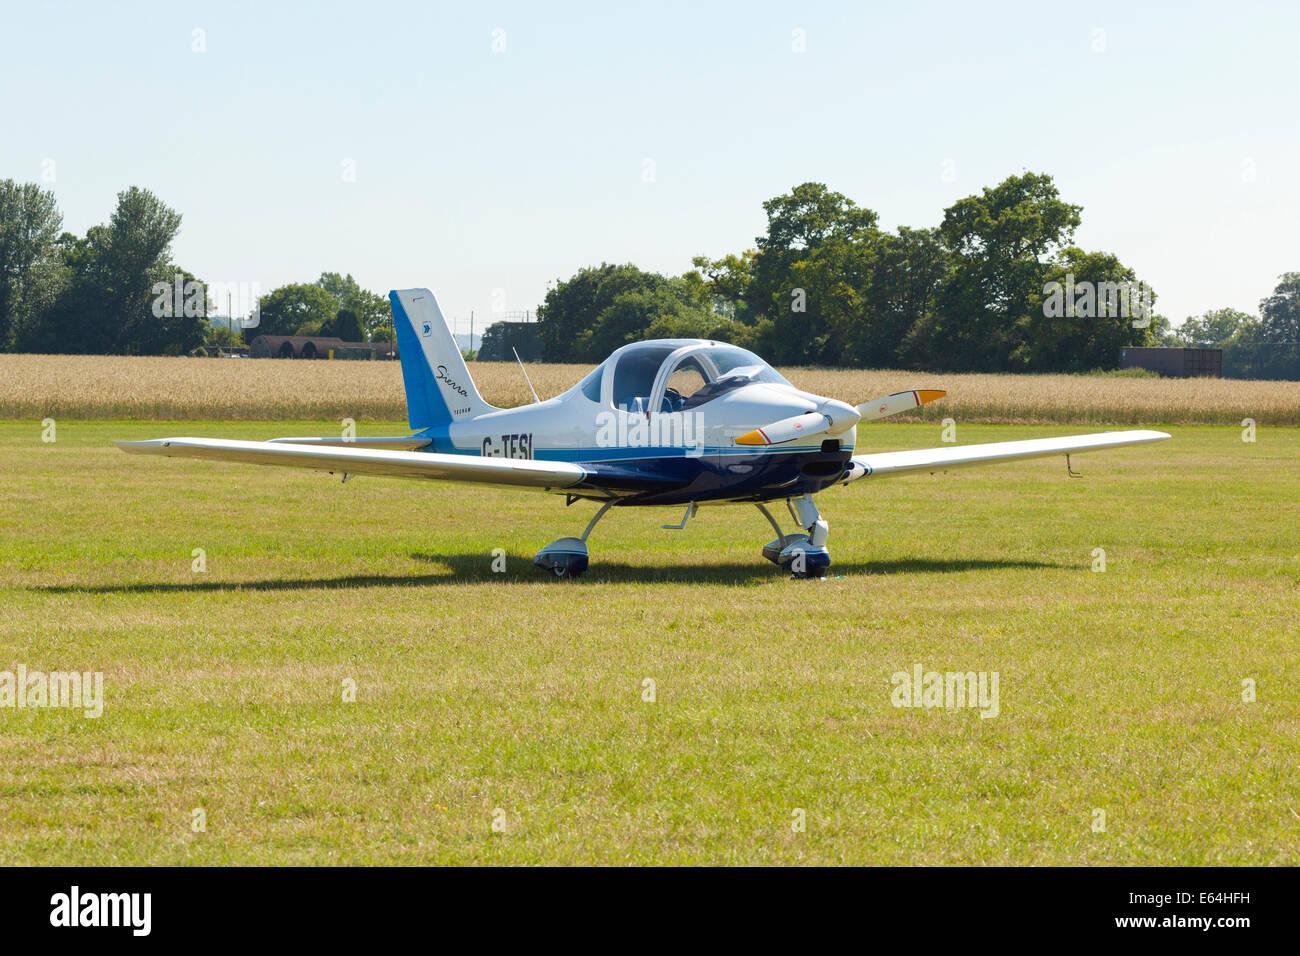 TECNAM P2002-EA SIERRA microlight aeroplane - Stock Image